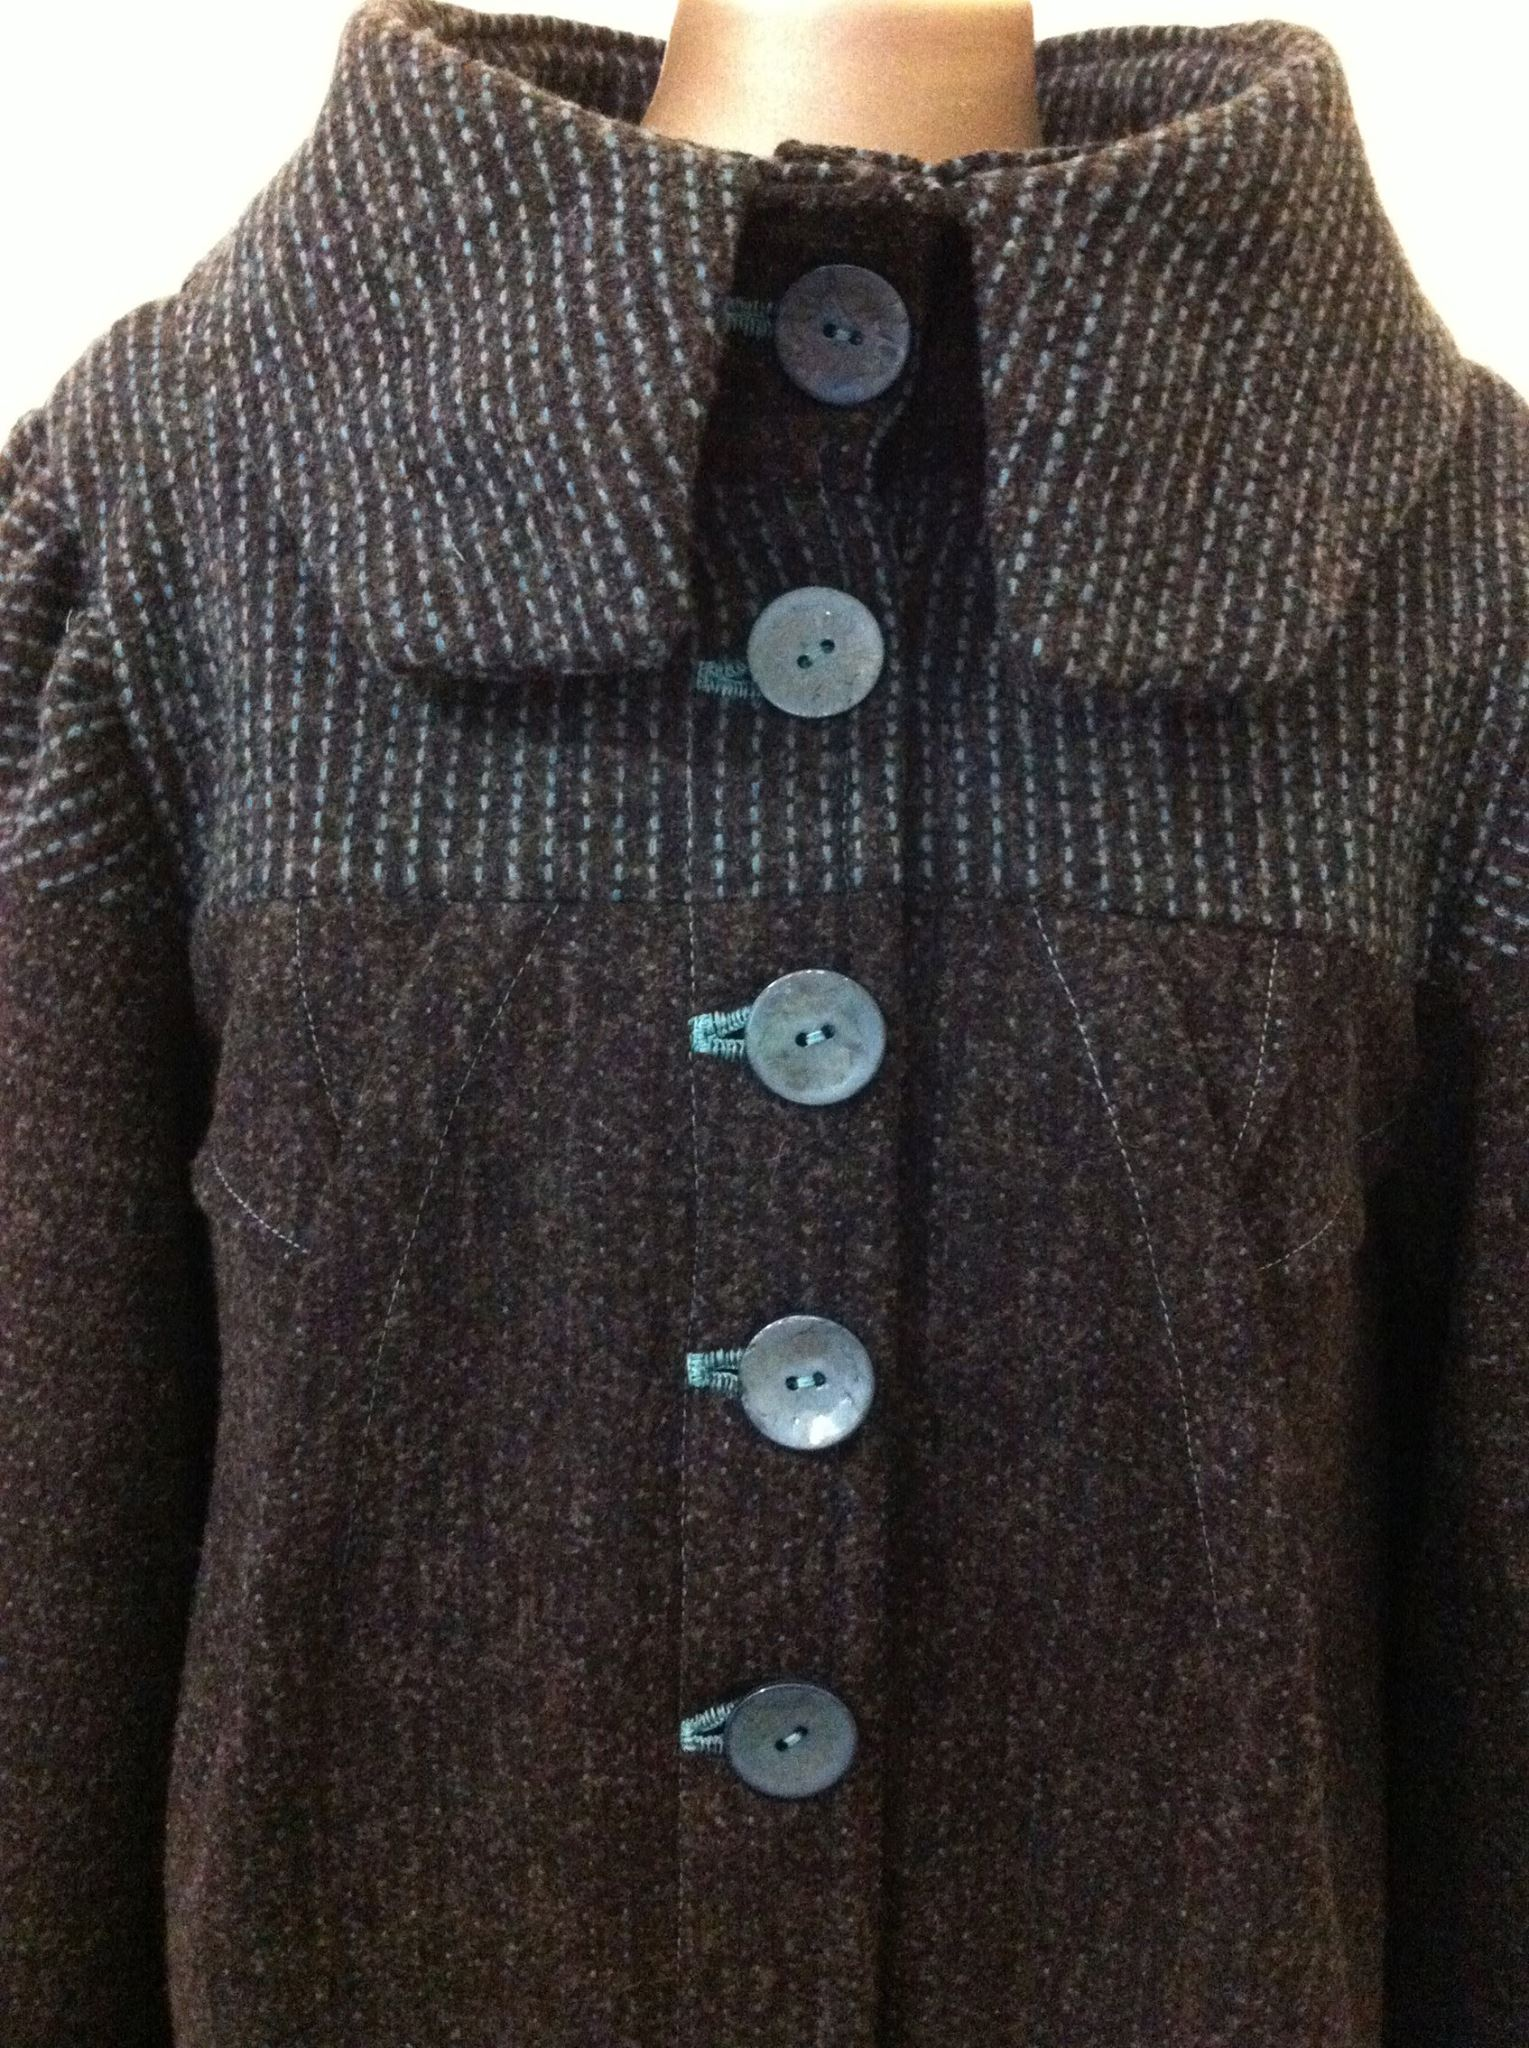 Bespoke winter coat